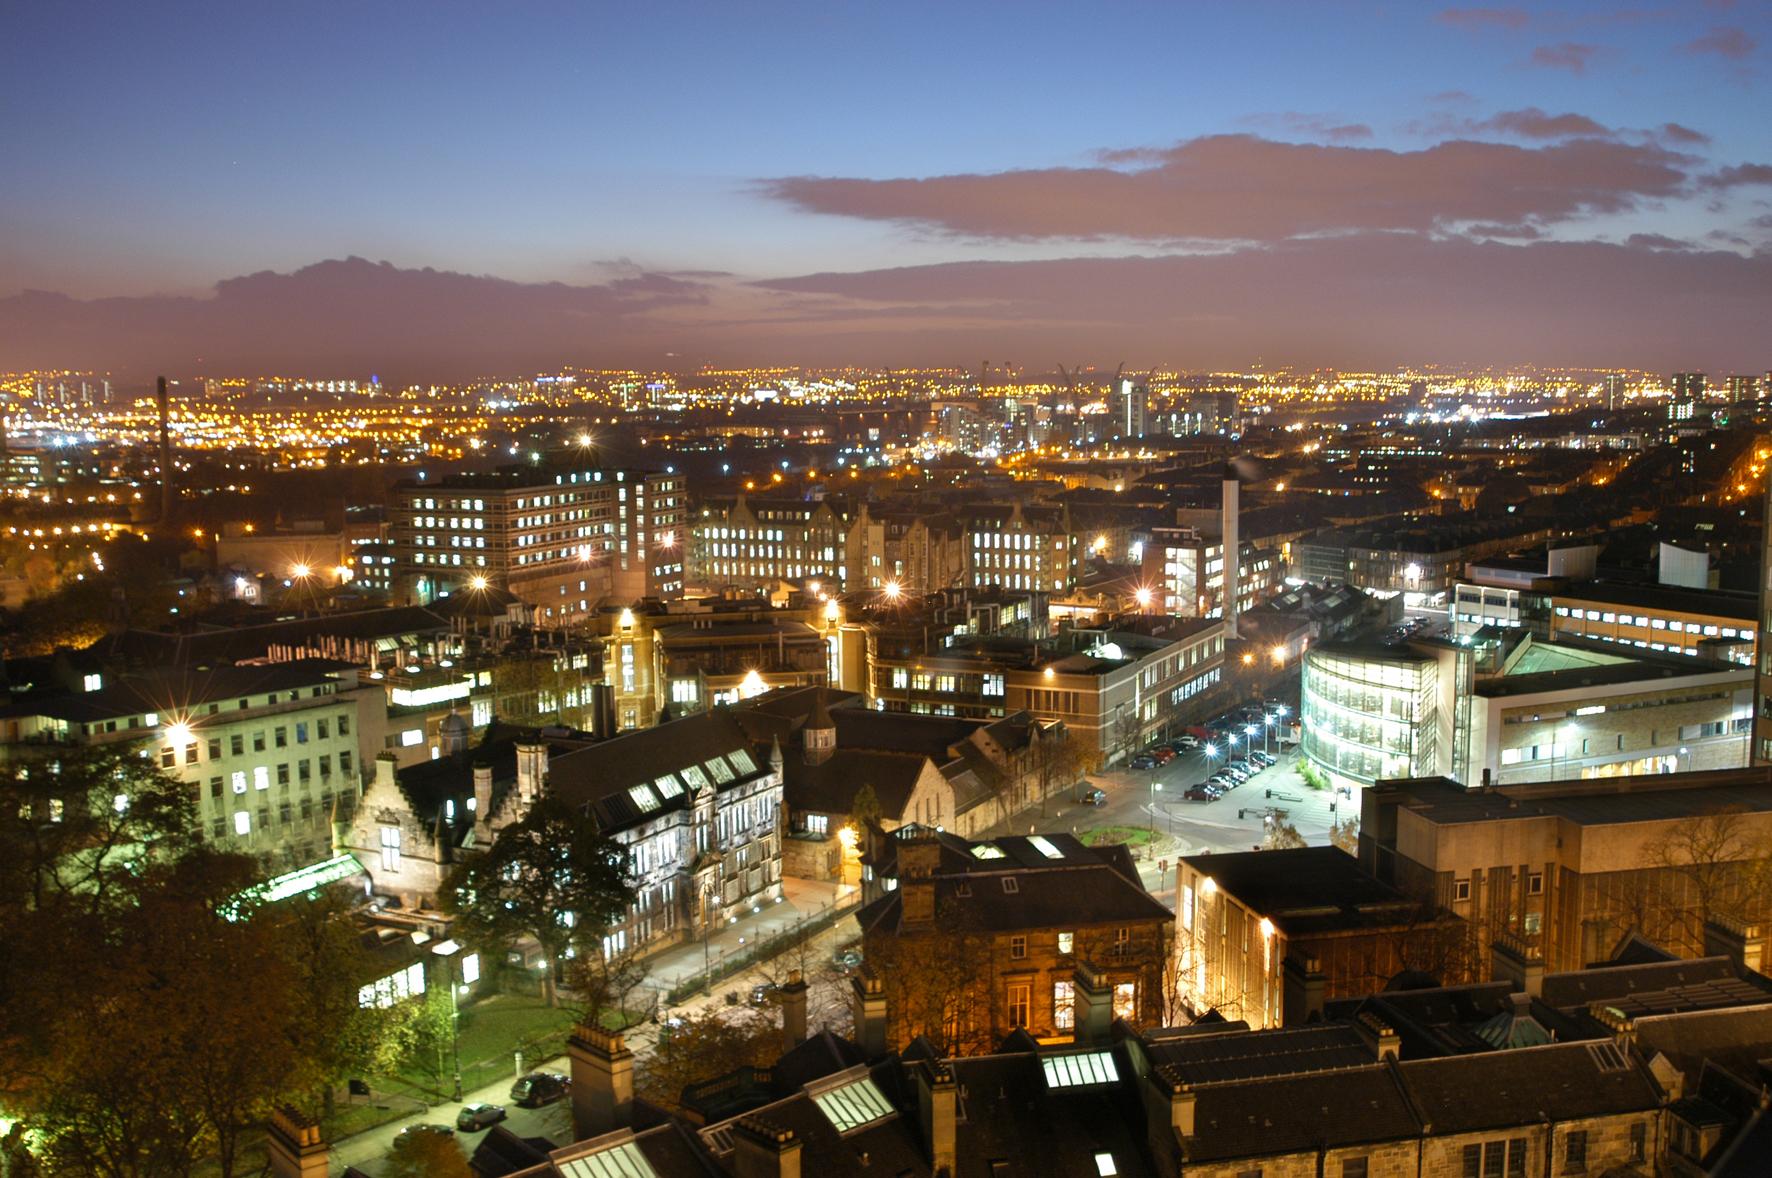 City view 16